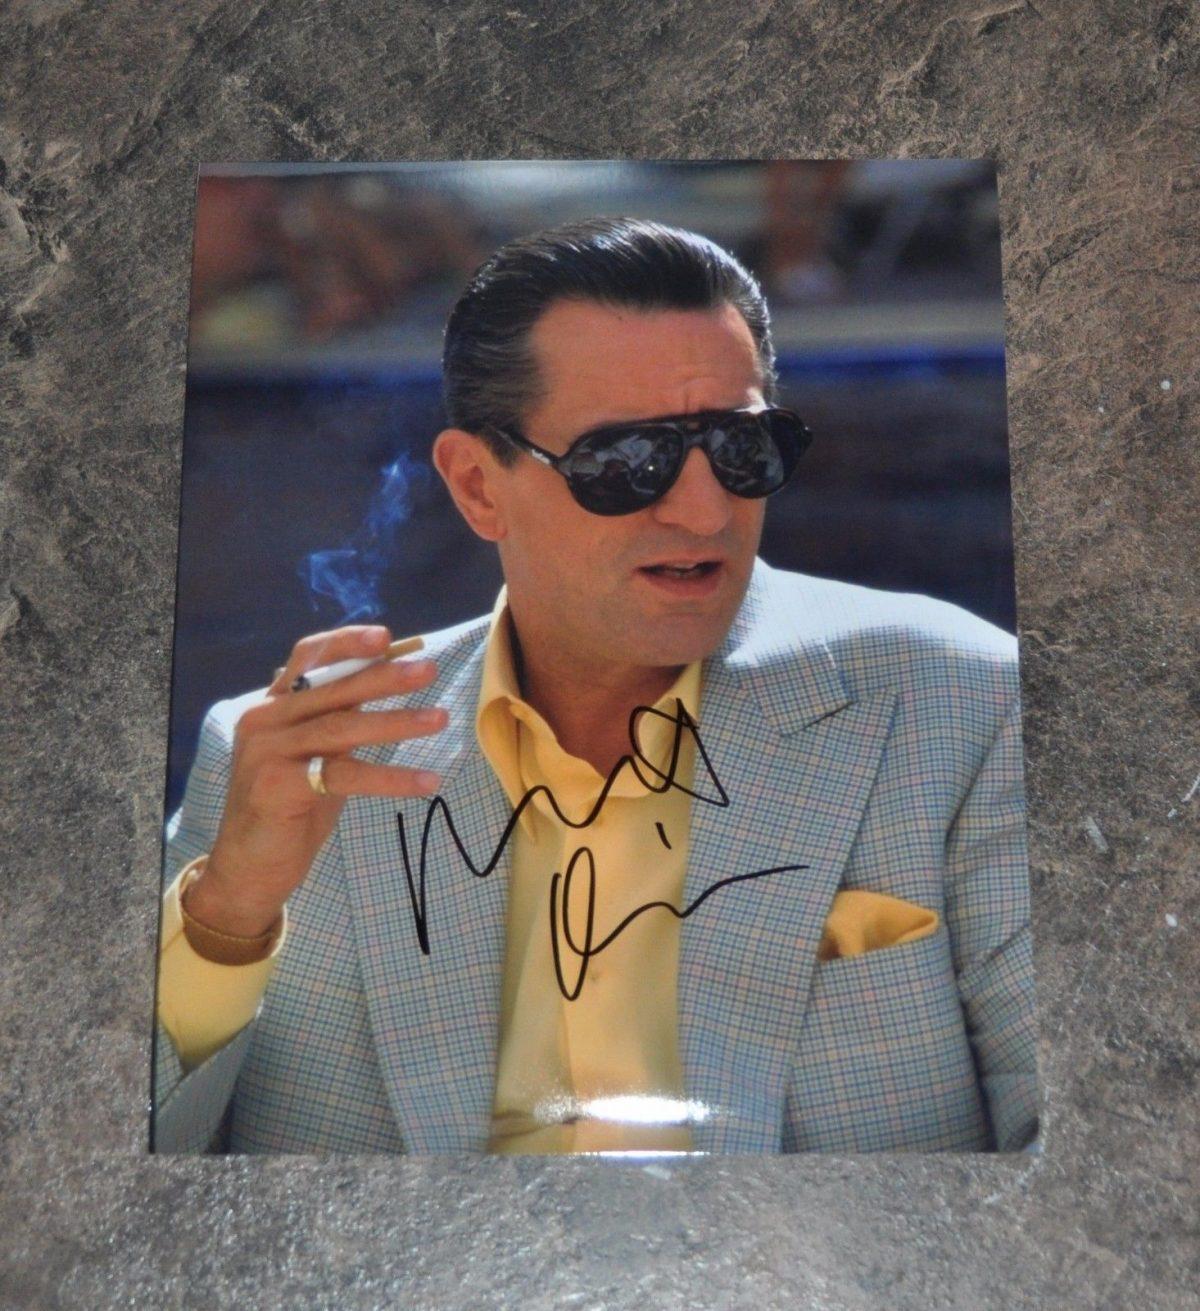 ROBERT DENIRO - ORIGINAL HAND SIGNED / AUTOGRAPHED 8x10 PHOTO CASINO